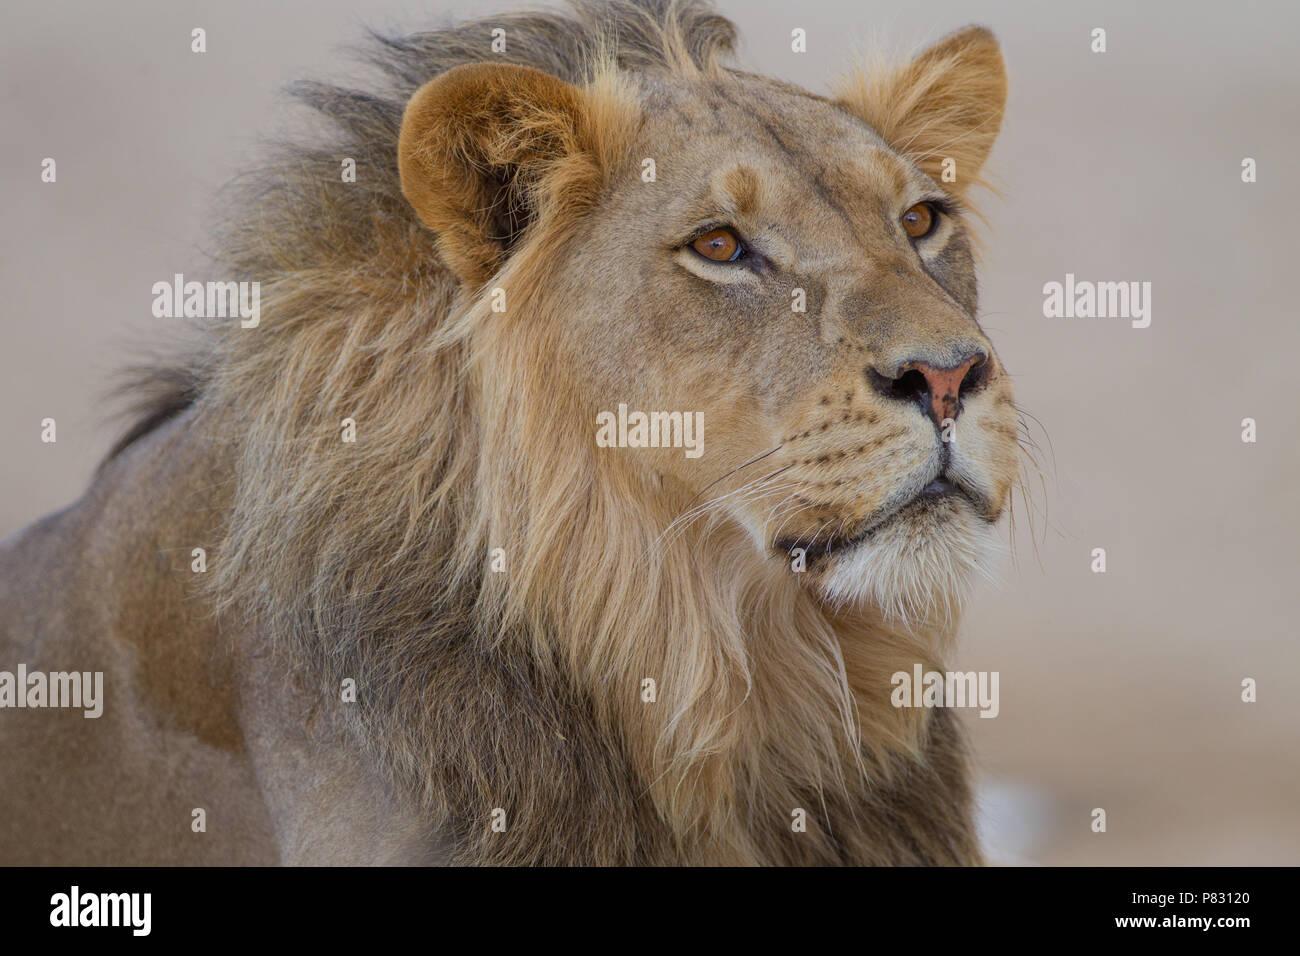 Macho león del desierto de Kalahari en porrait Imagen De Stock